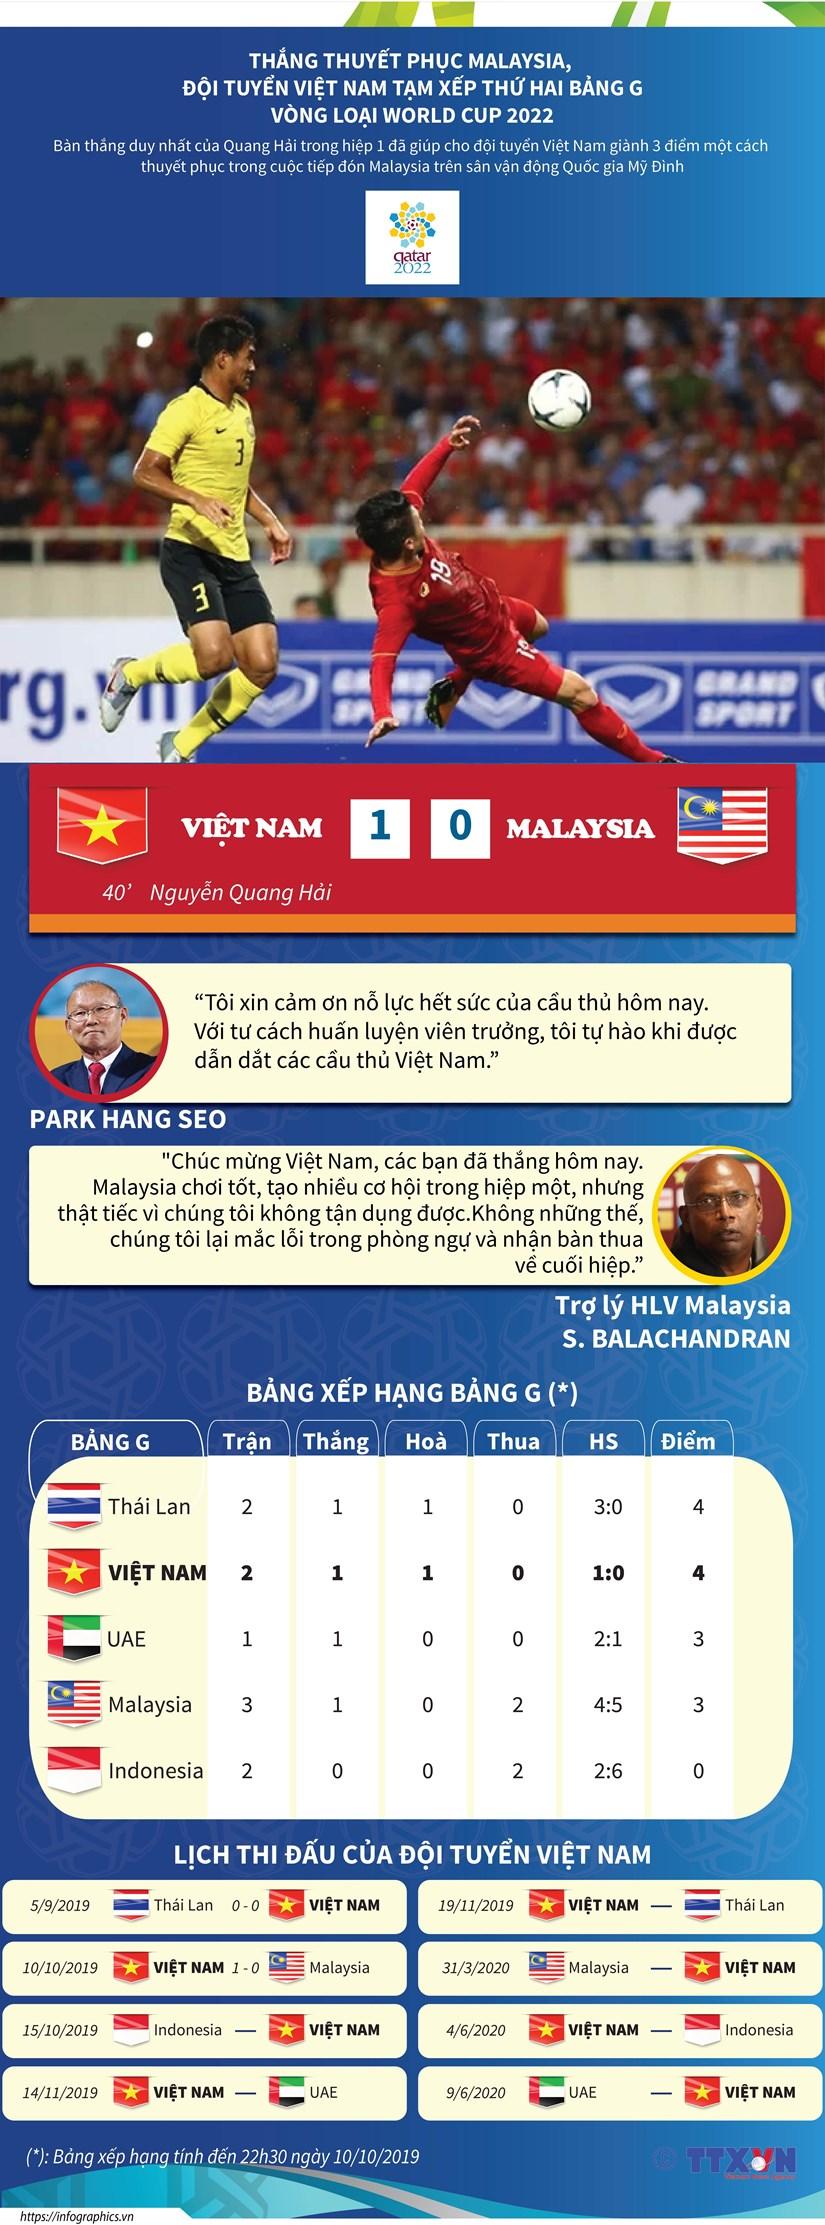 Thang Malaysia, doi Viet Nam tam xep thu 2 bang G vong loai World Cup hinh anh 1